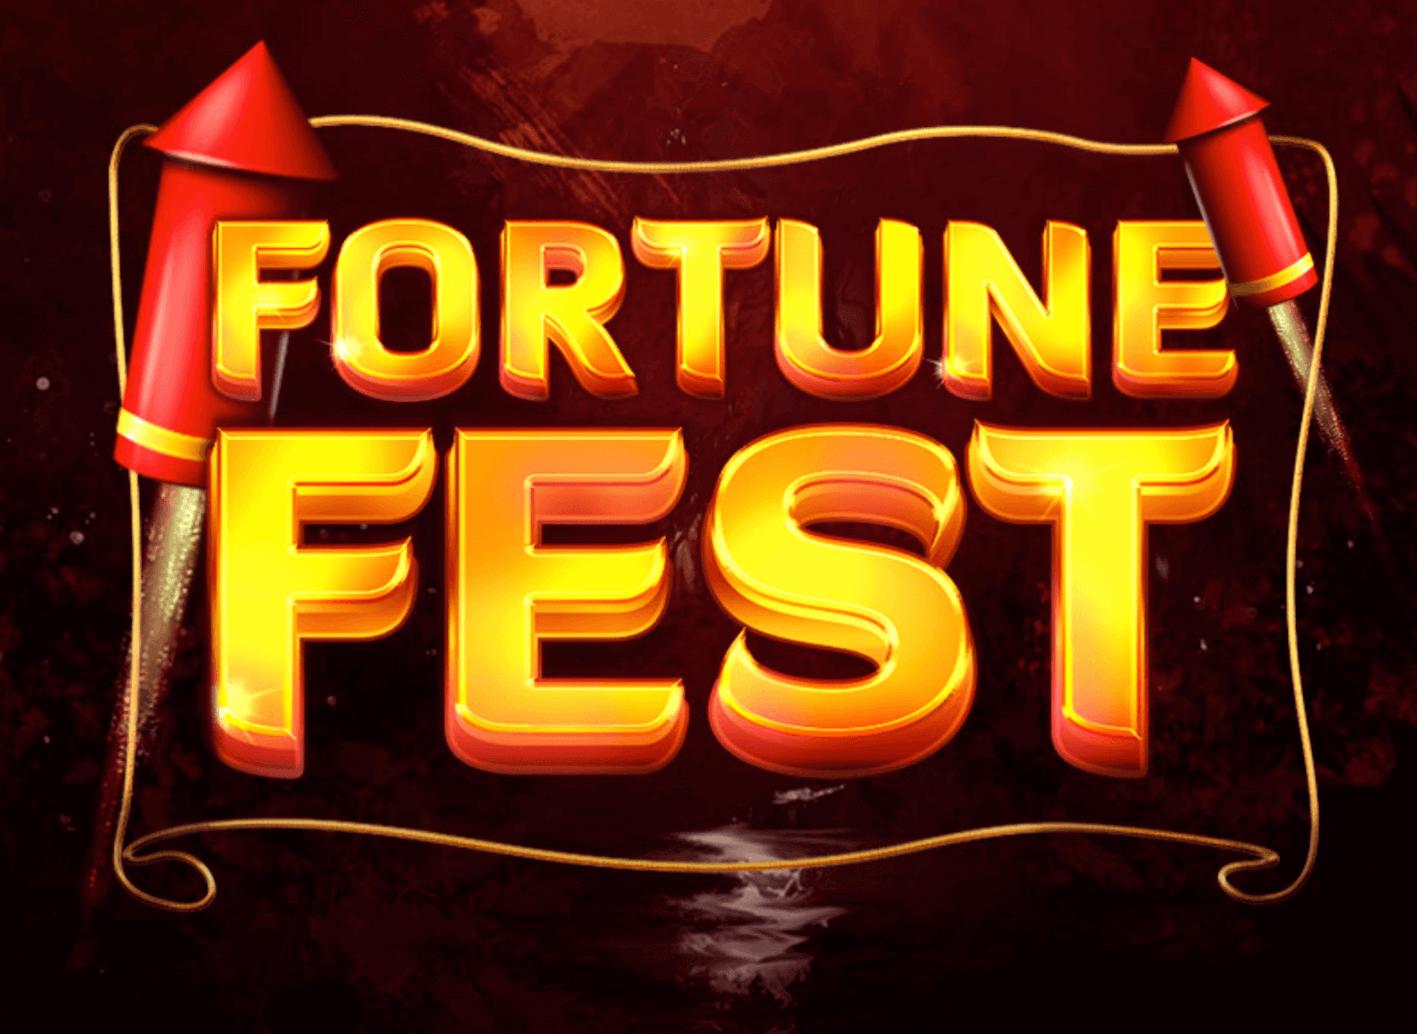 fortune fest 2